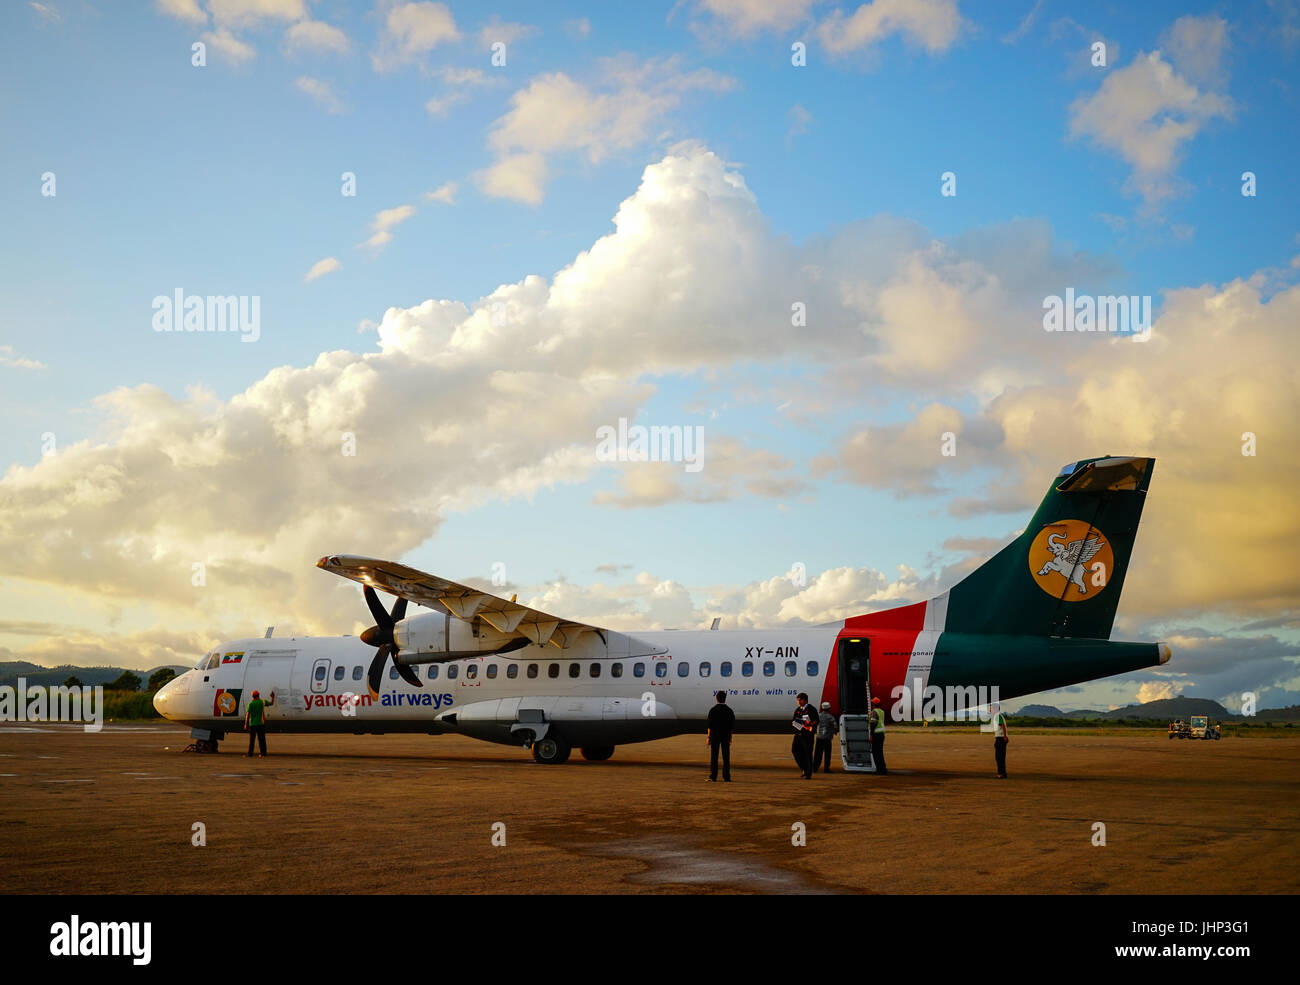 Mandalay, Myanmar - Oct 16, 2015. Civil aircraft parking at Mandalay International airport in Mandalay, Myanmar. - Stock Image